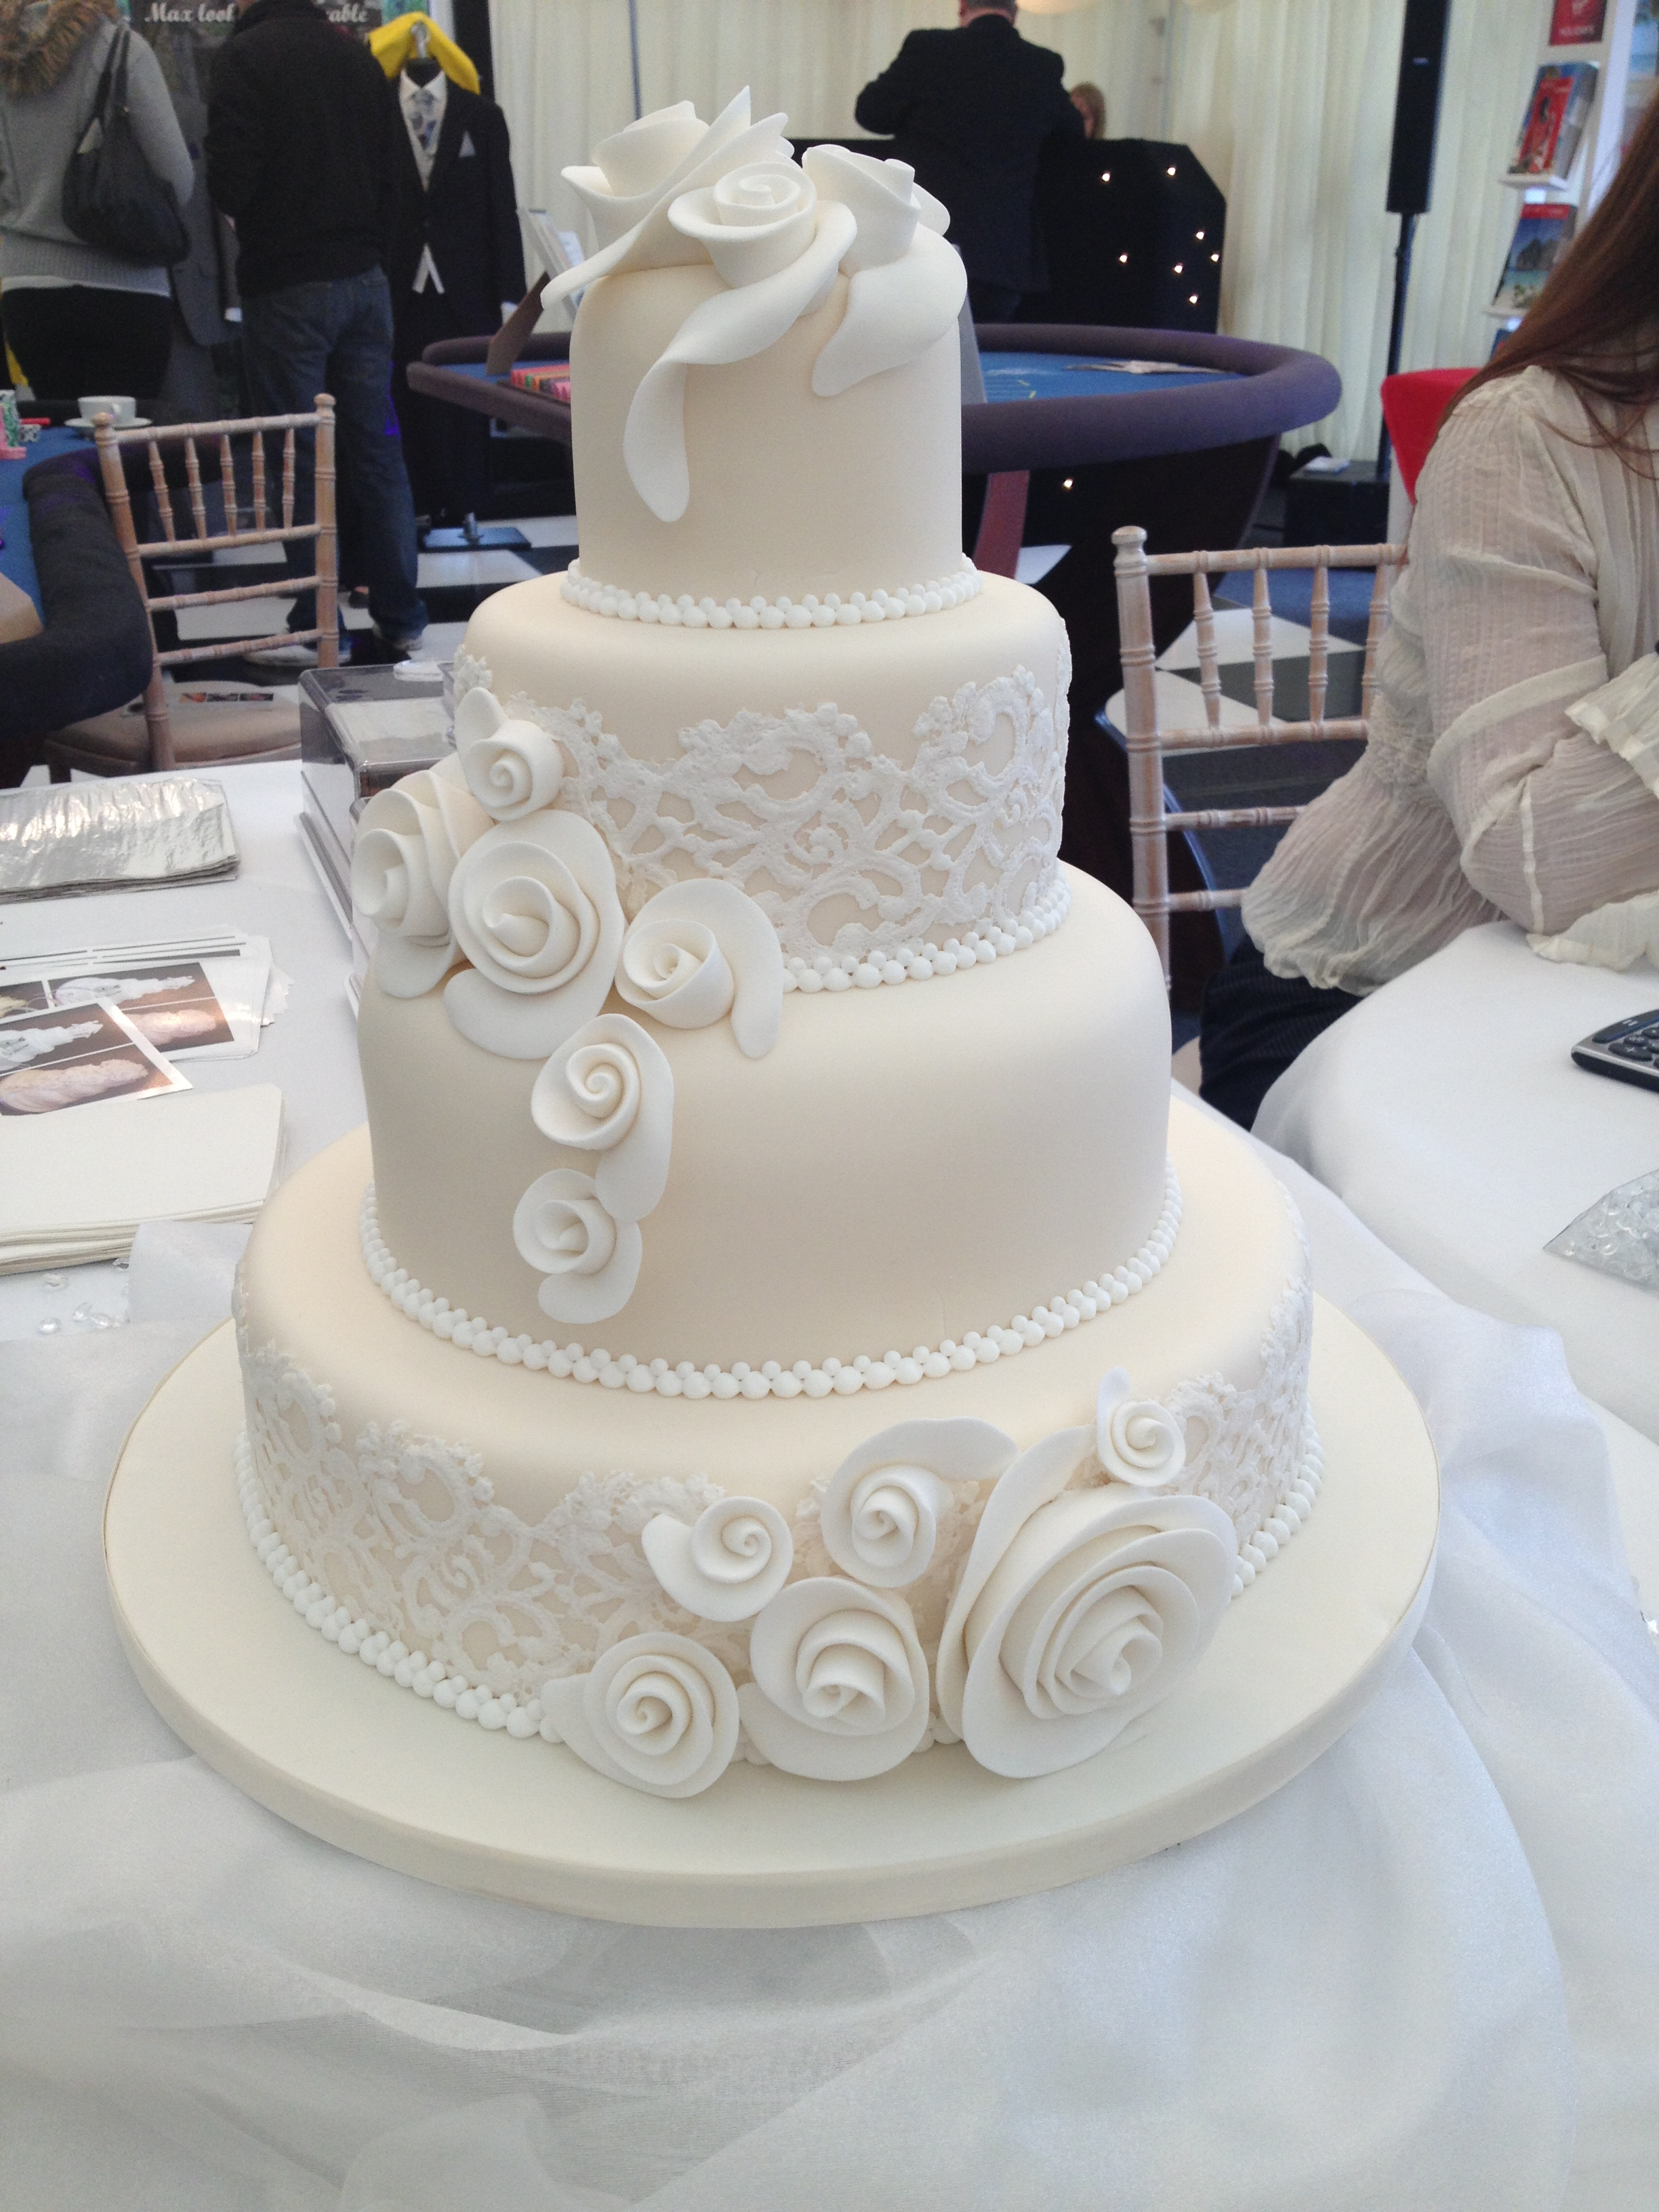 Wedding Cakes in Surrey « Harlequin Fun Casino Hire